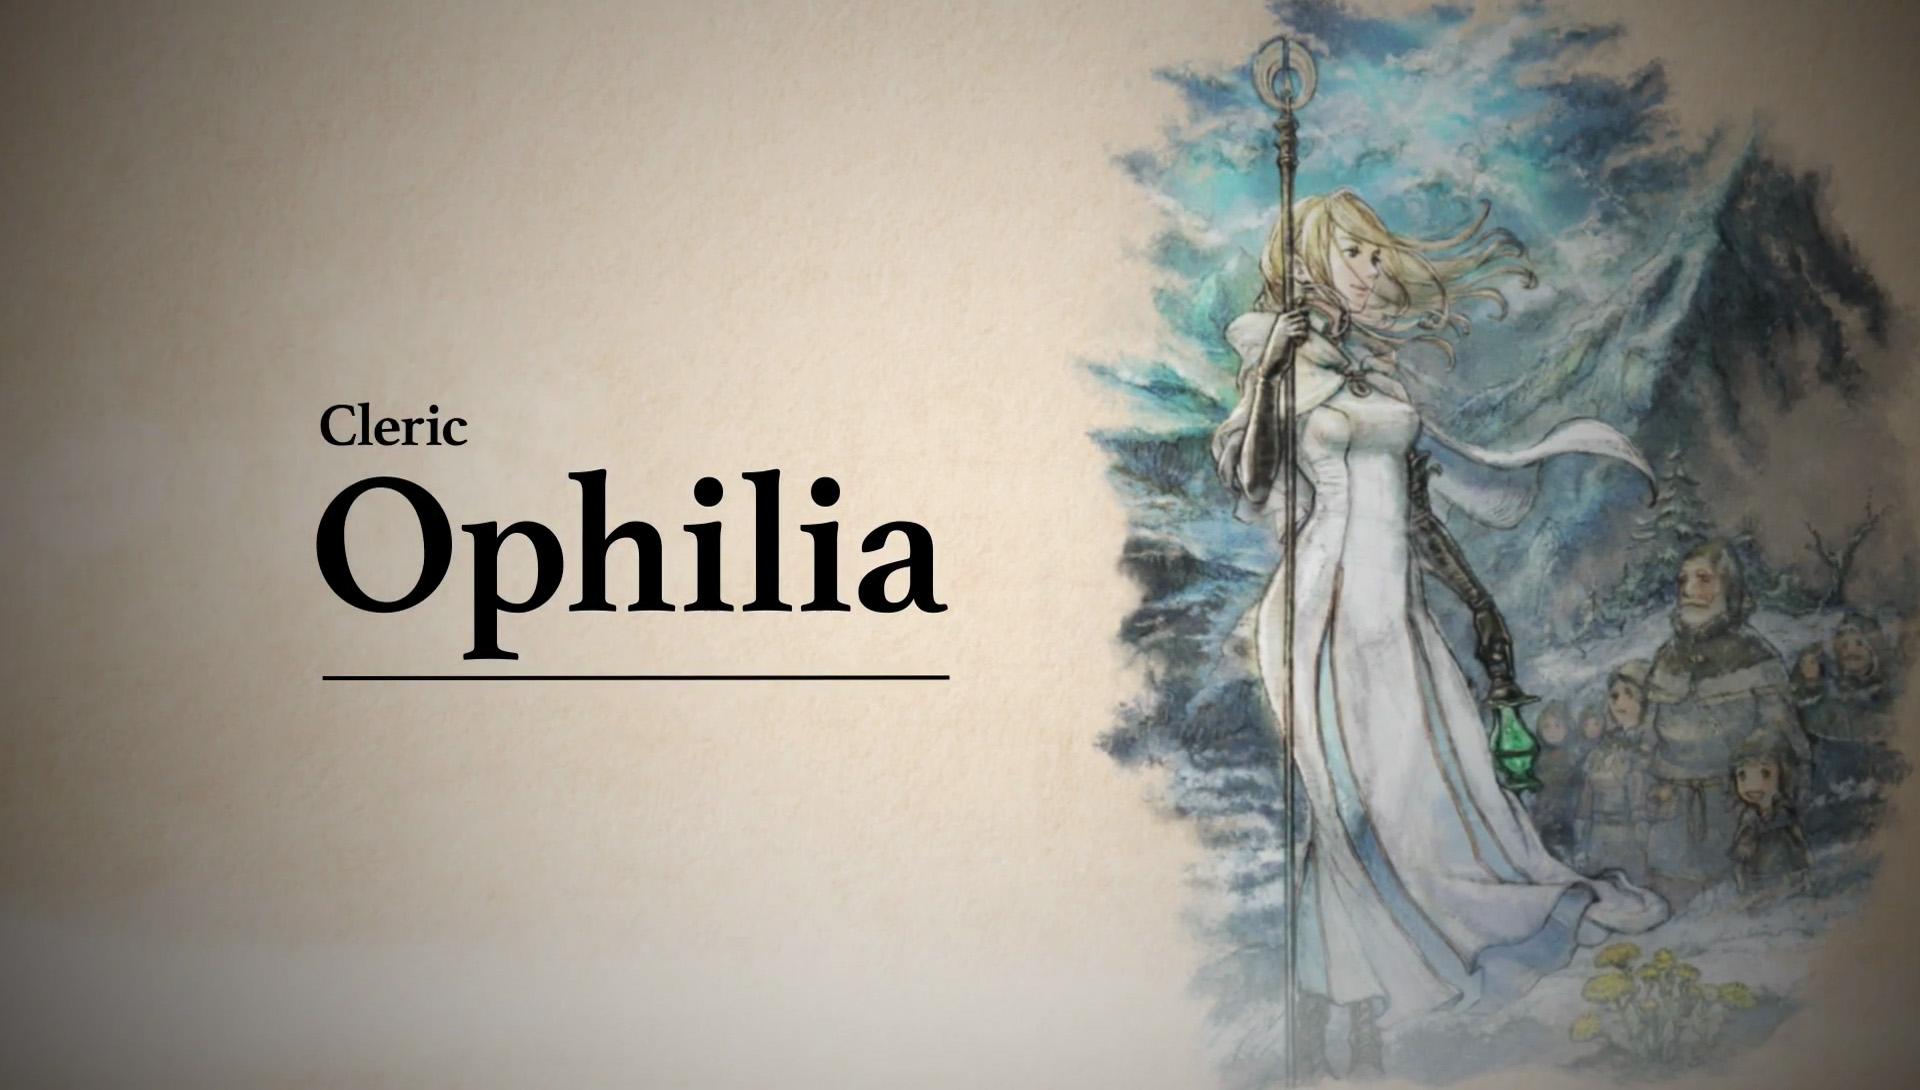 Wallpaper : Octopath Traveler, video games, cleric ...